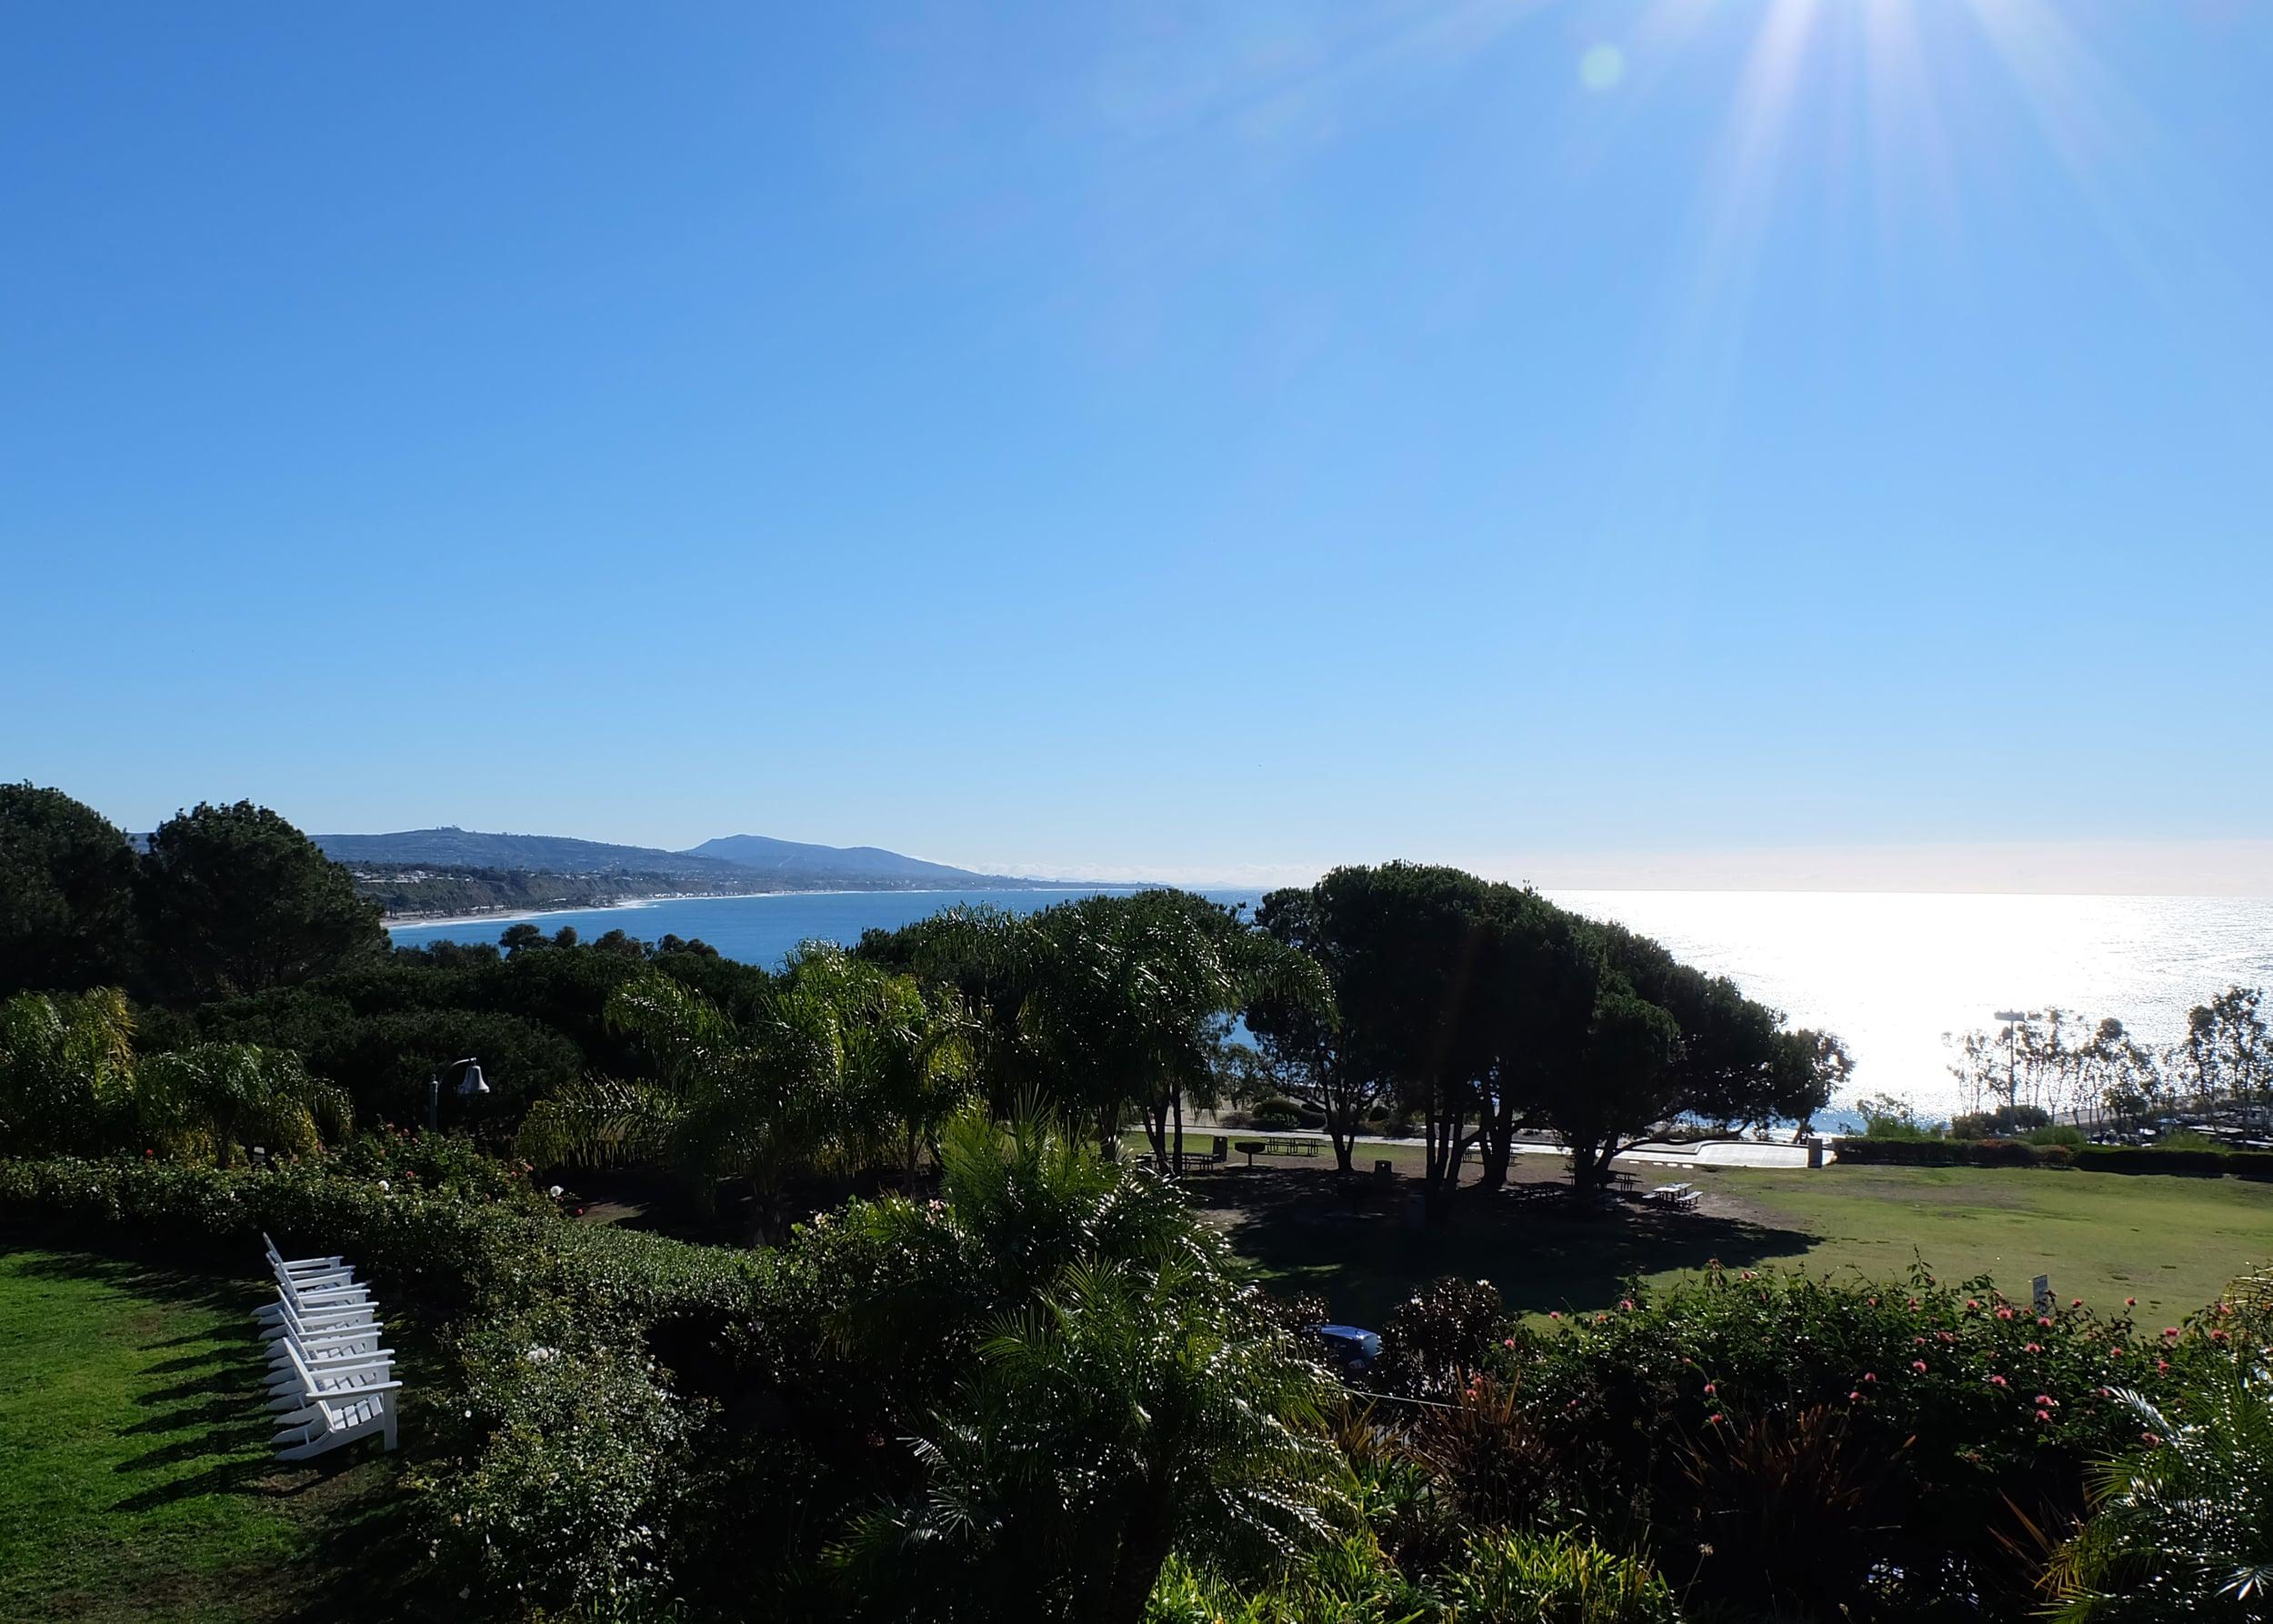 View from Laguna Cliffs Marriott Overlooking Latern Bay Park